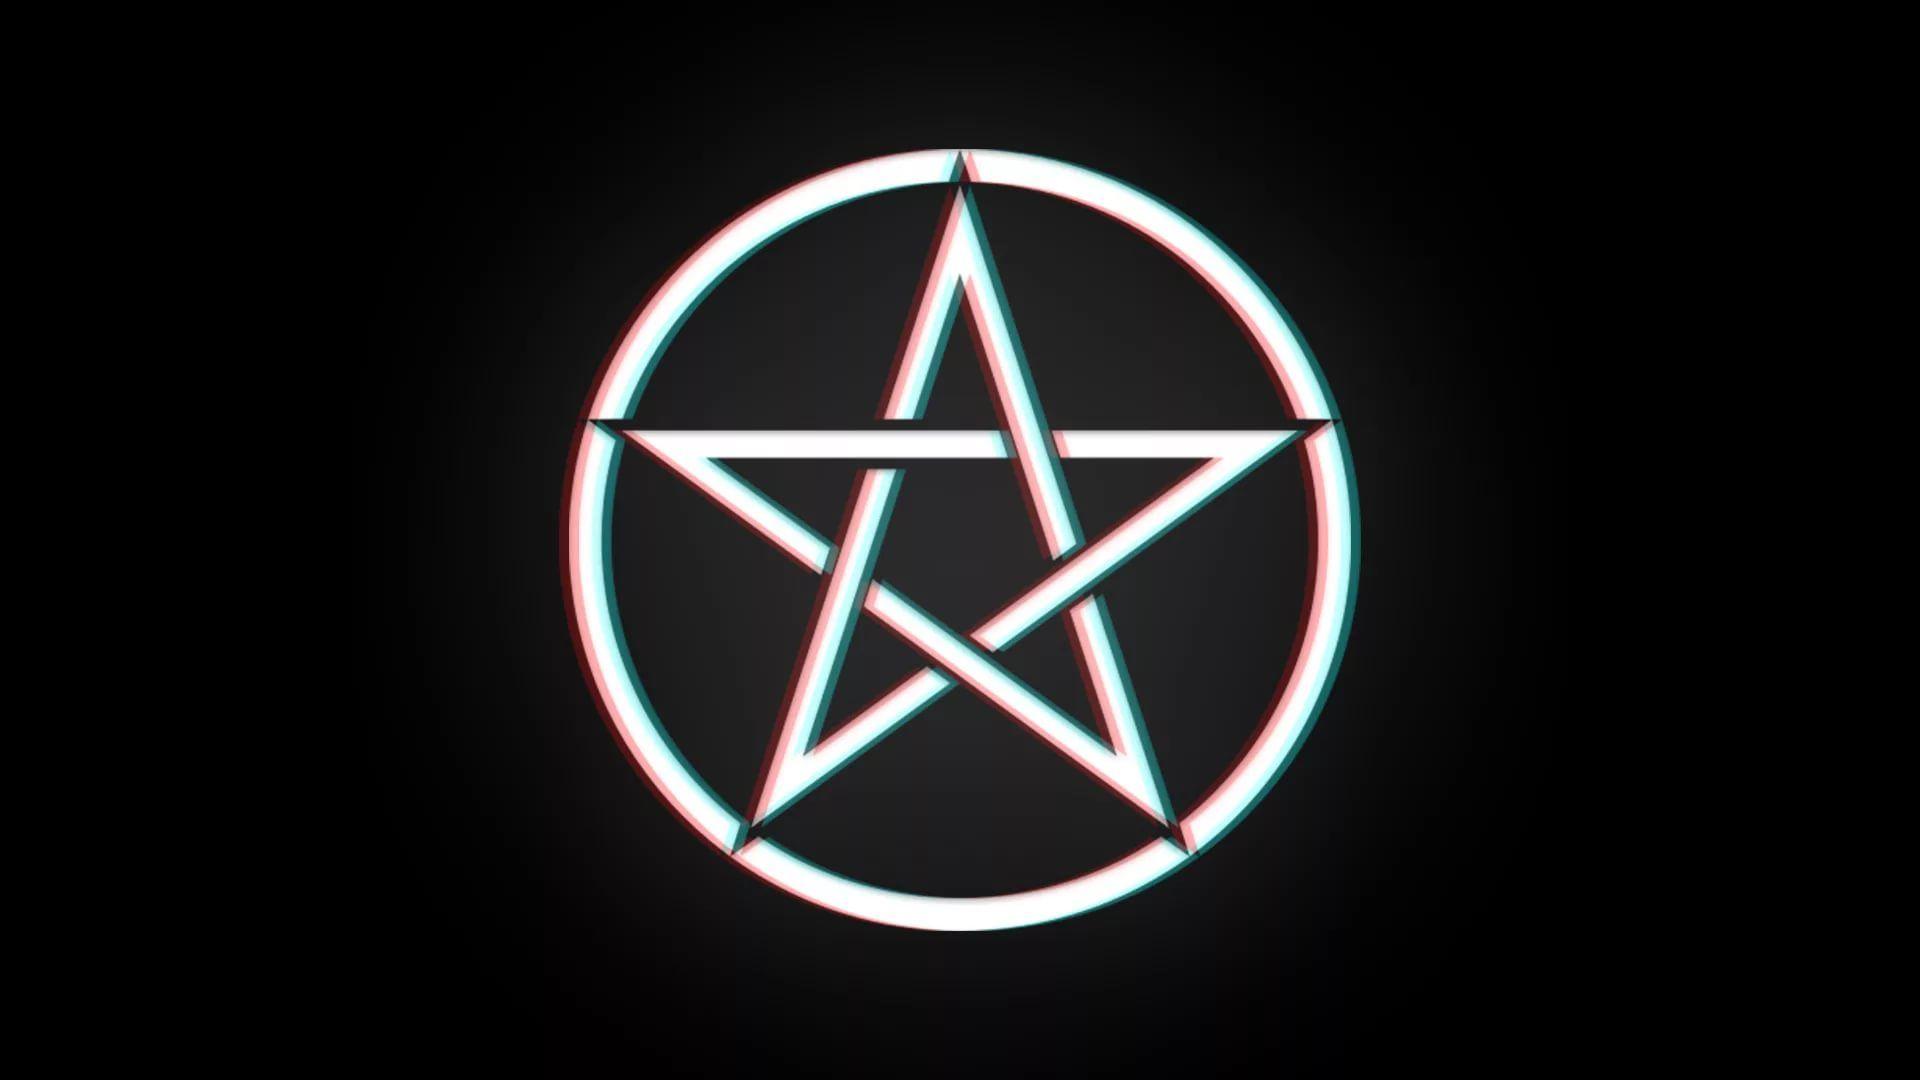 Pentagram hd wallpaper download